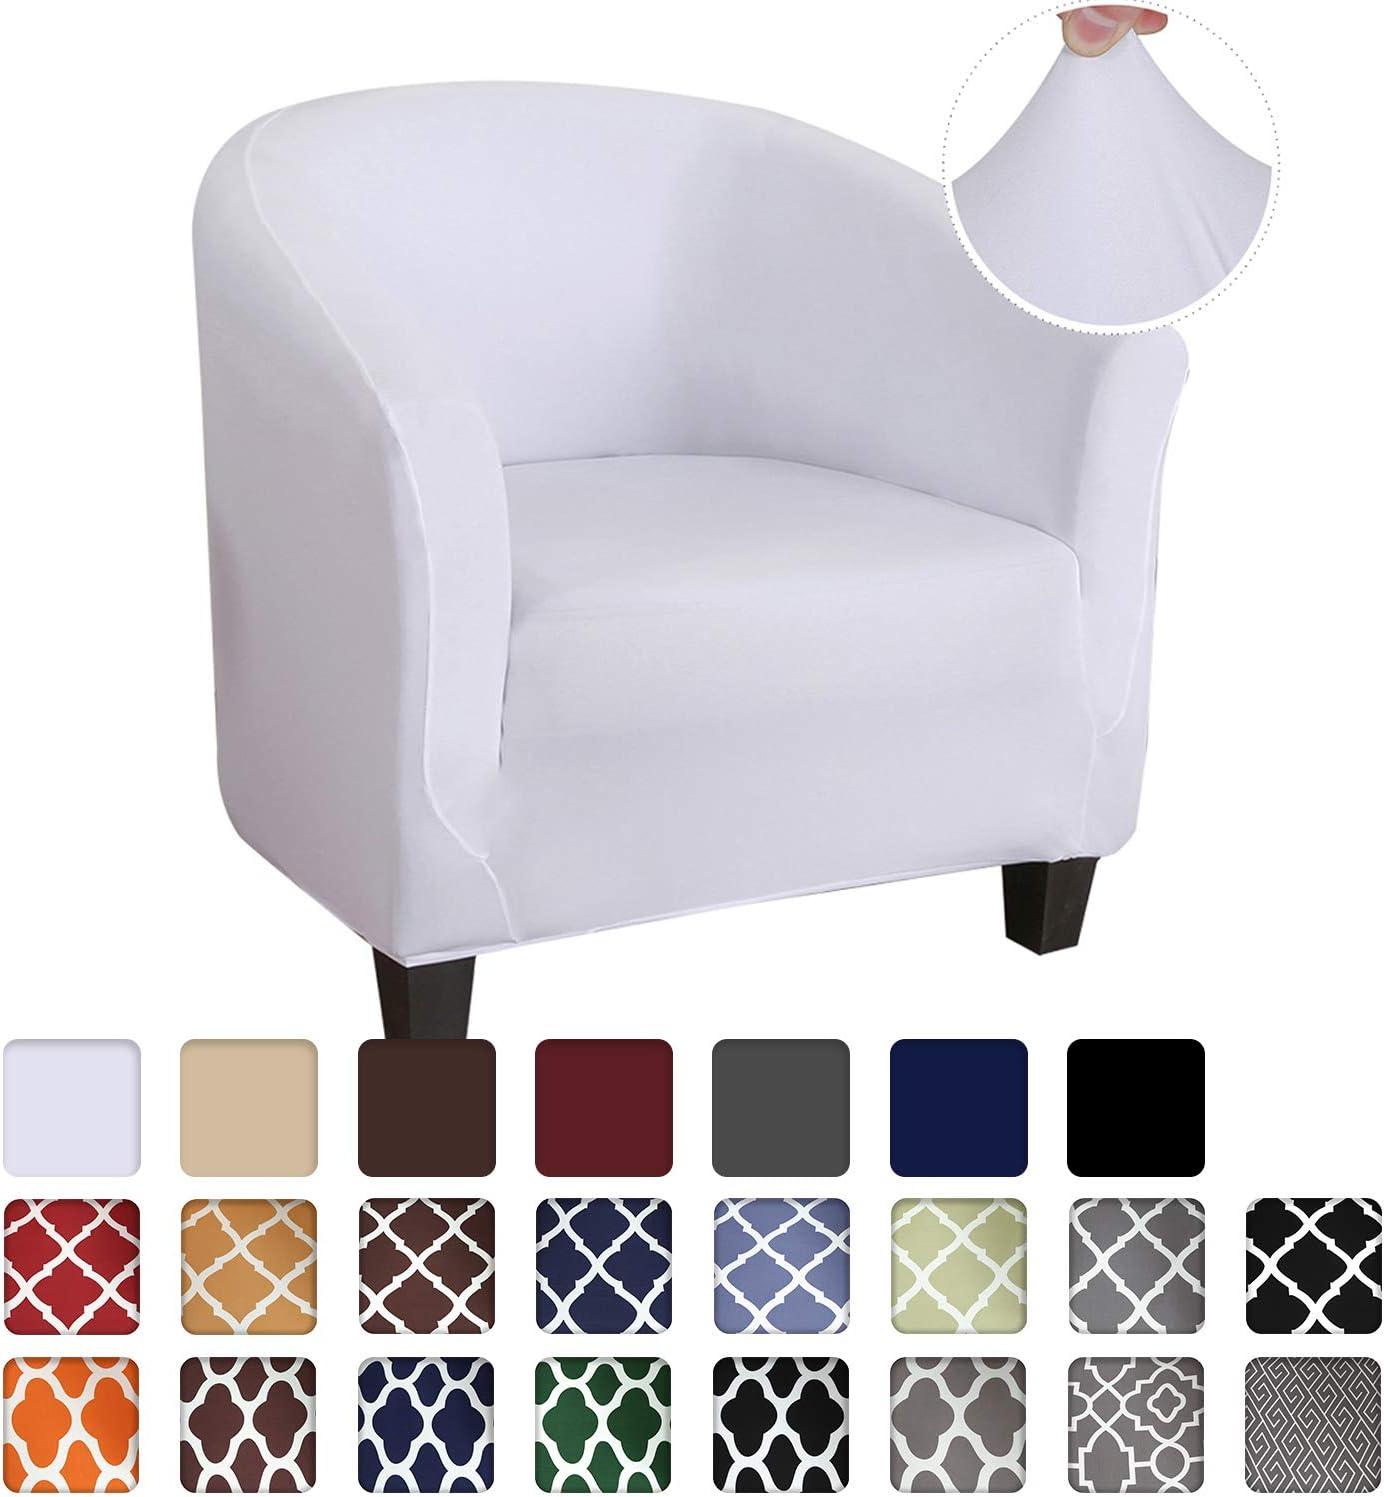 HIFUAR Funda de Sillón Chesterfield Elásticas Lavable Cubre Sofá de 1 Plaza Universal Antideslizantes Cubierta Protector de Muebles para Butaca,Sofá,Chester 1 Plaza,Color Blanco